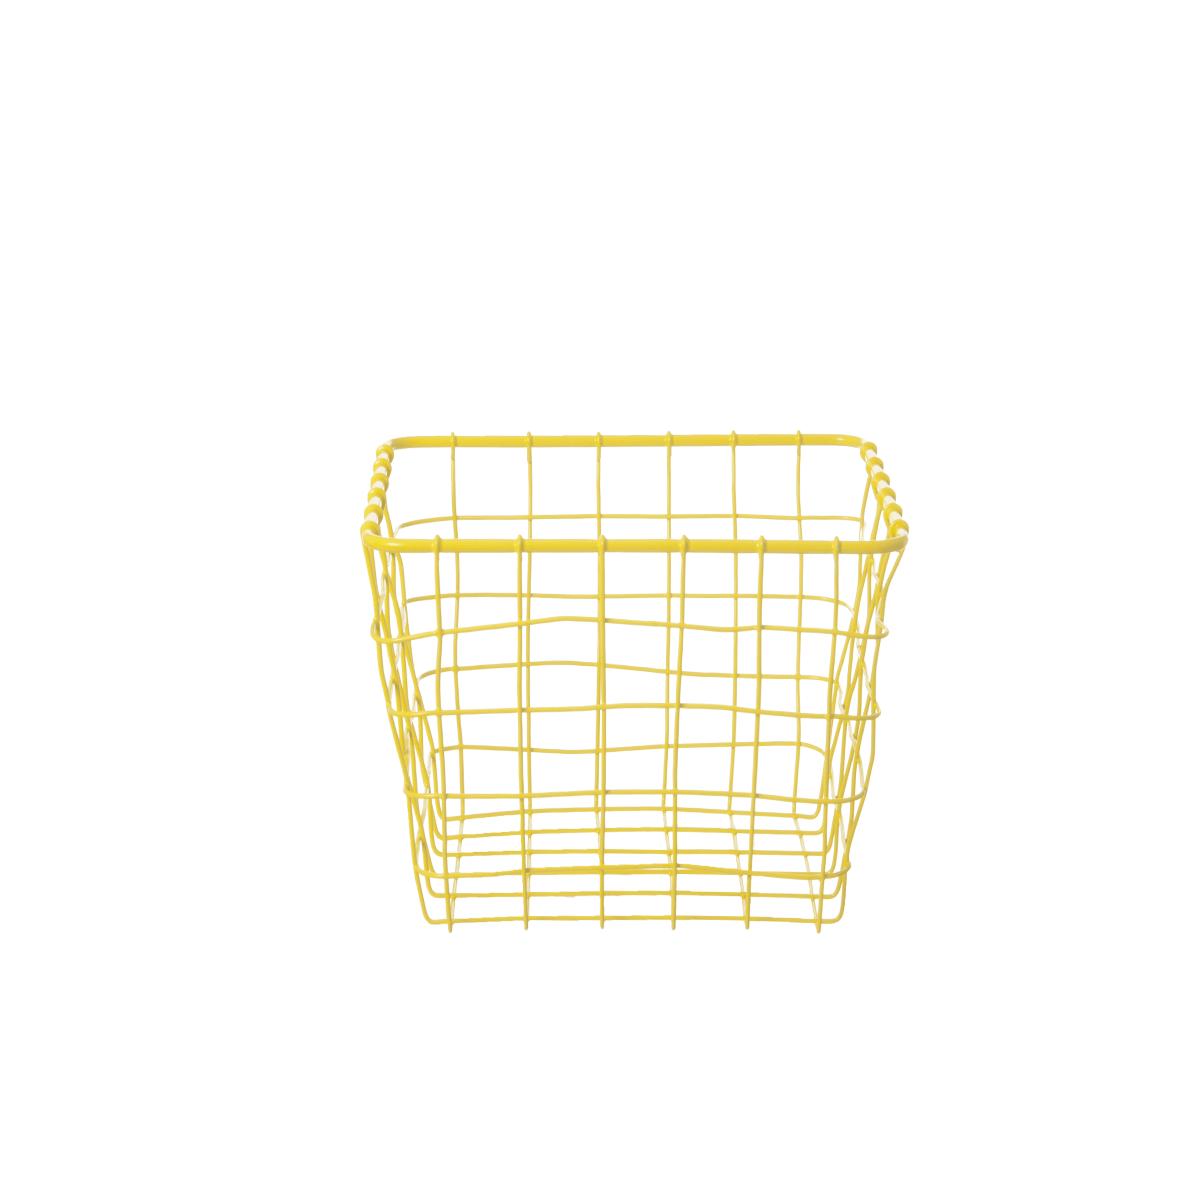 panier carr m tal jaune canari rangement. Black Bedroom Furniture Sets. Home Design Ideas